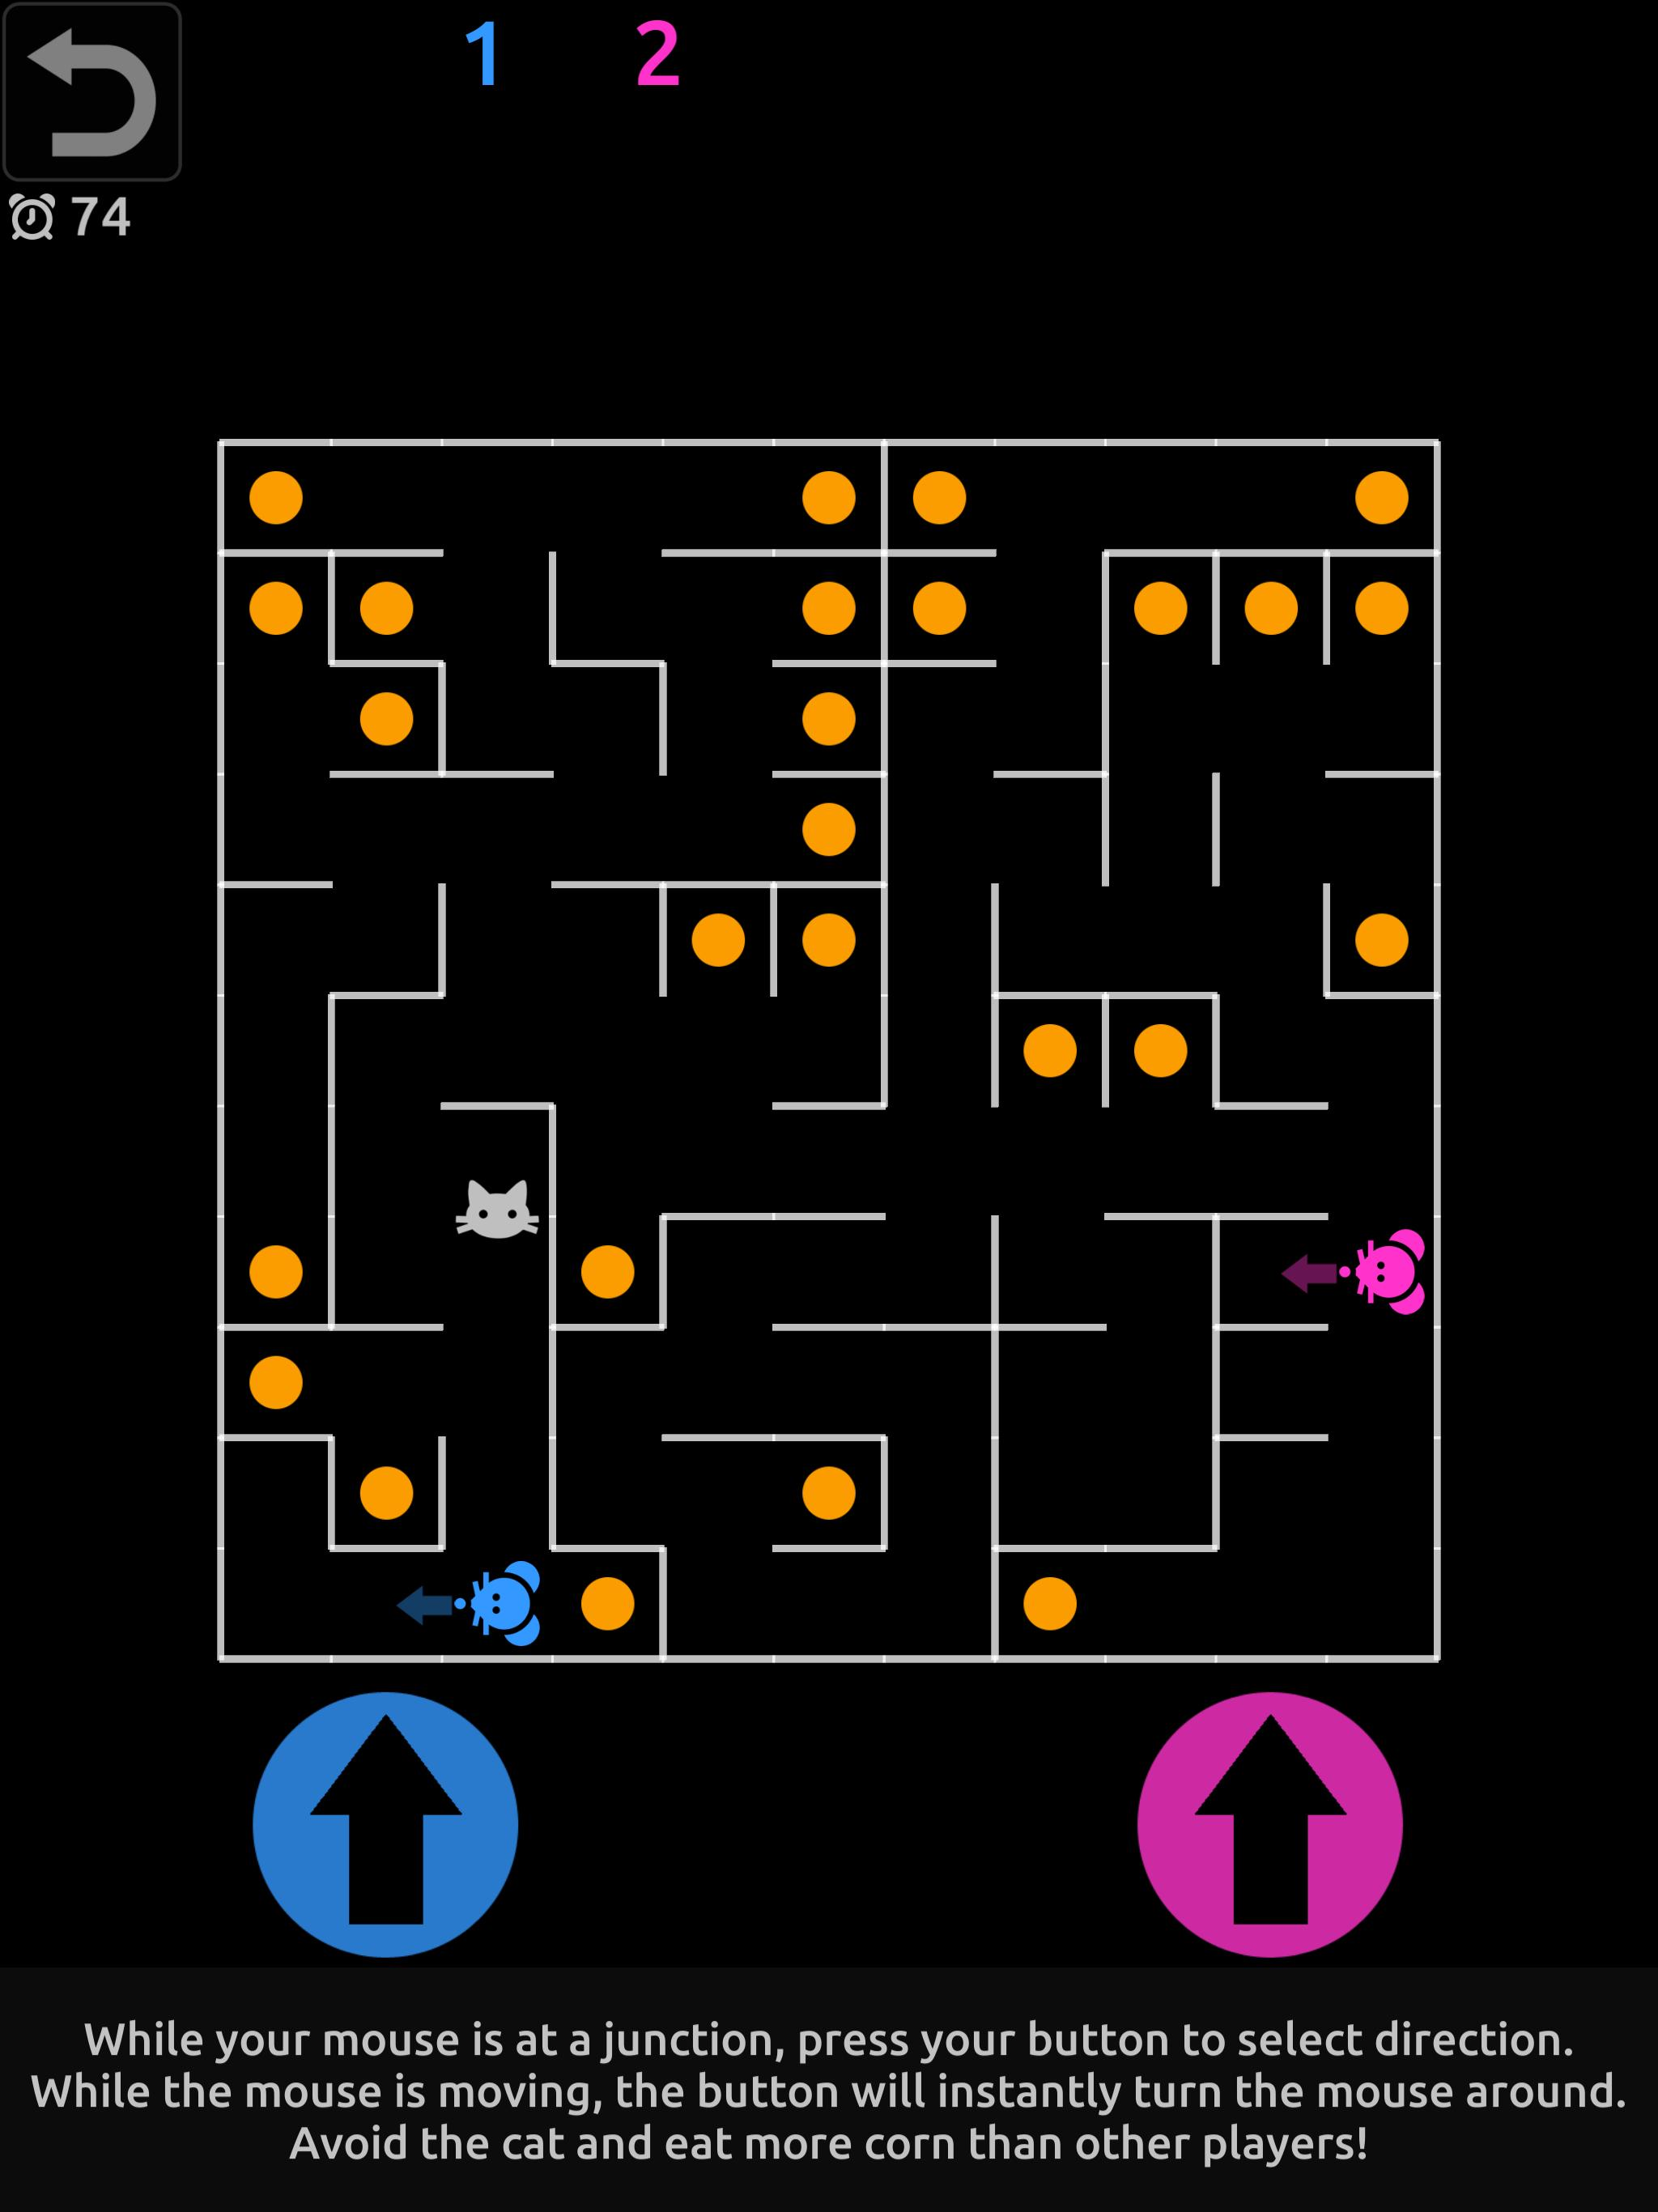 2 players games free download site desertdiamondcasino.com desert diamond casino